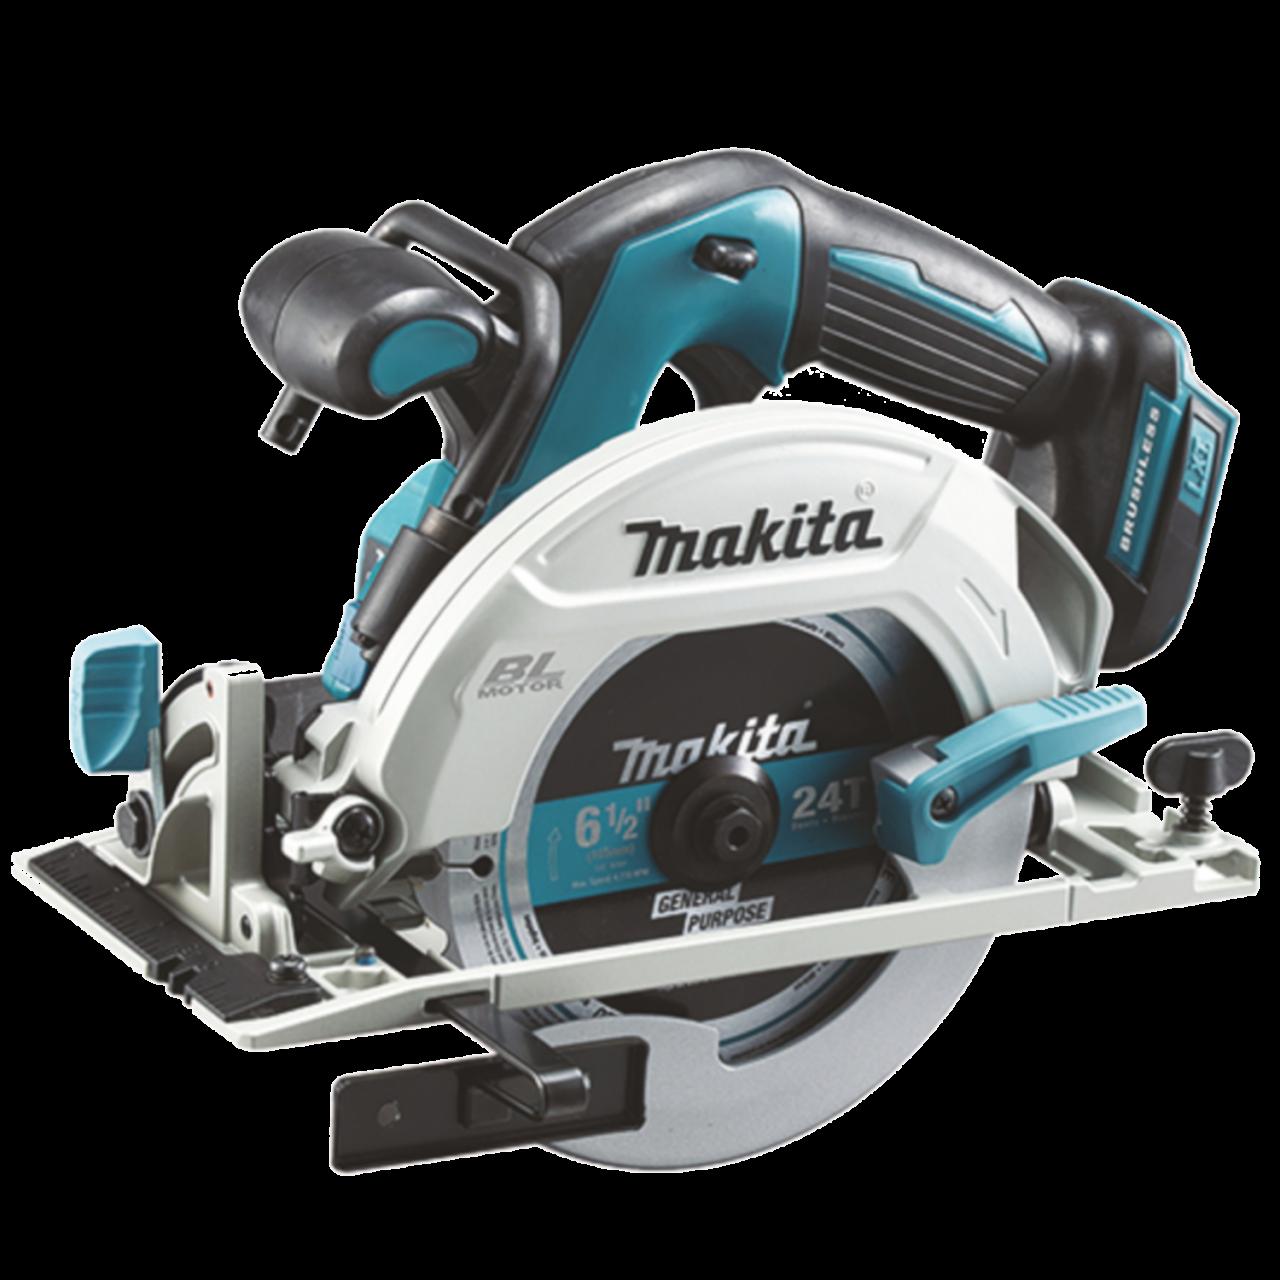 Makita DHS680ZJ Akku-Handkreissäge im MAKPAC Gr. 3 inkl. Einlage, 18V, 57 mm, 5.000 min-1